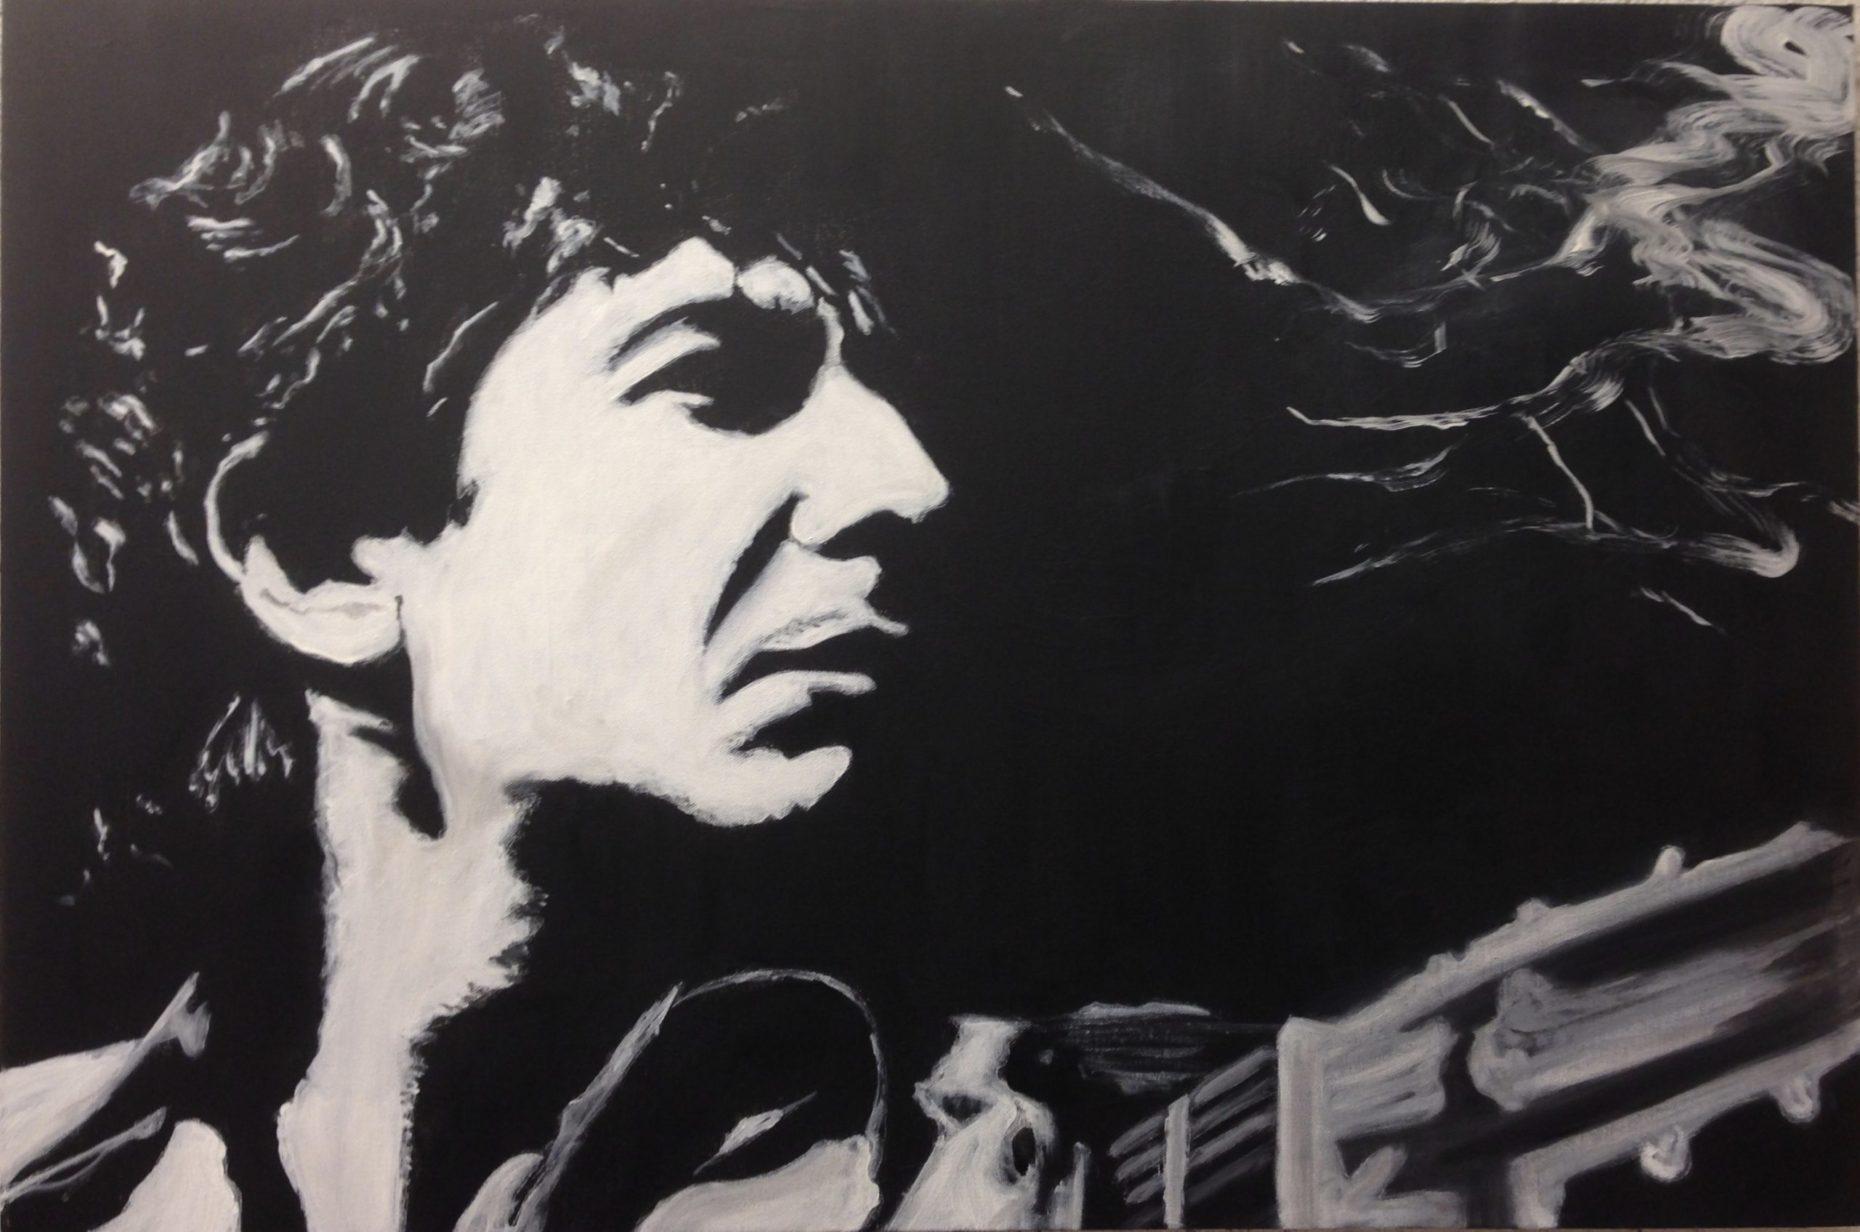 Oil painting of Leonard Cohen